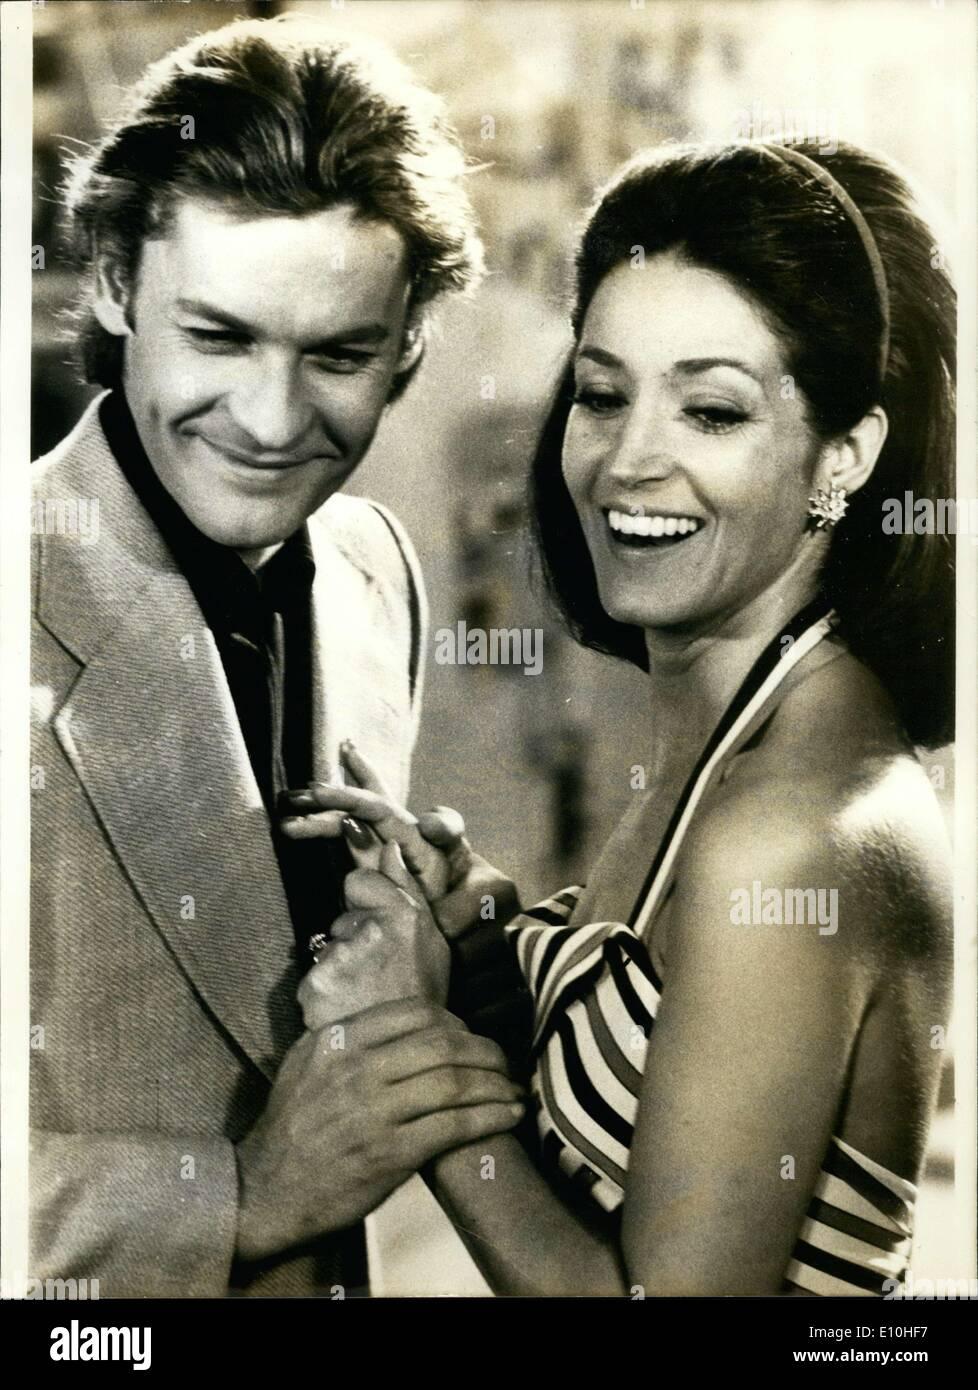 Nov. 13, 1972 - Helmut Berger and Francoise Fabian in ''Les Voraces' - Stock Image